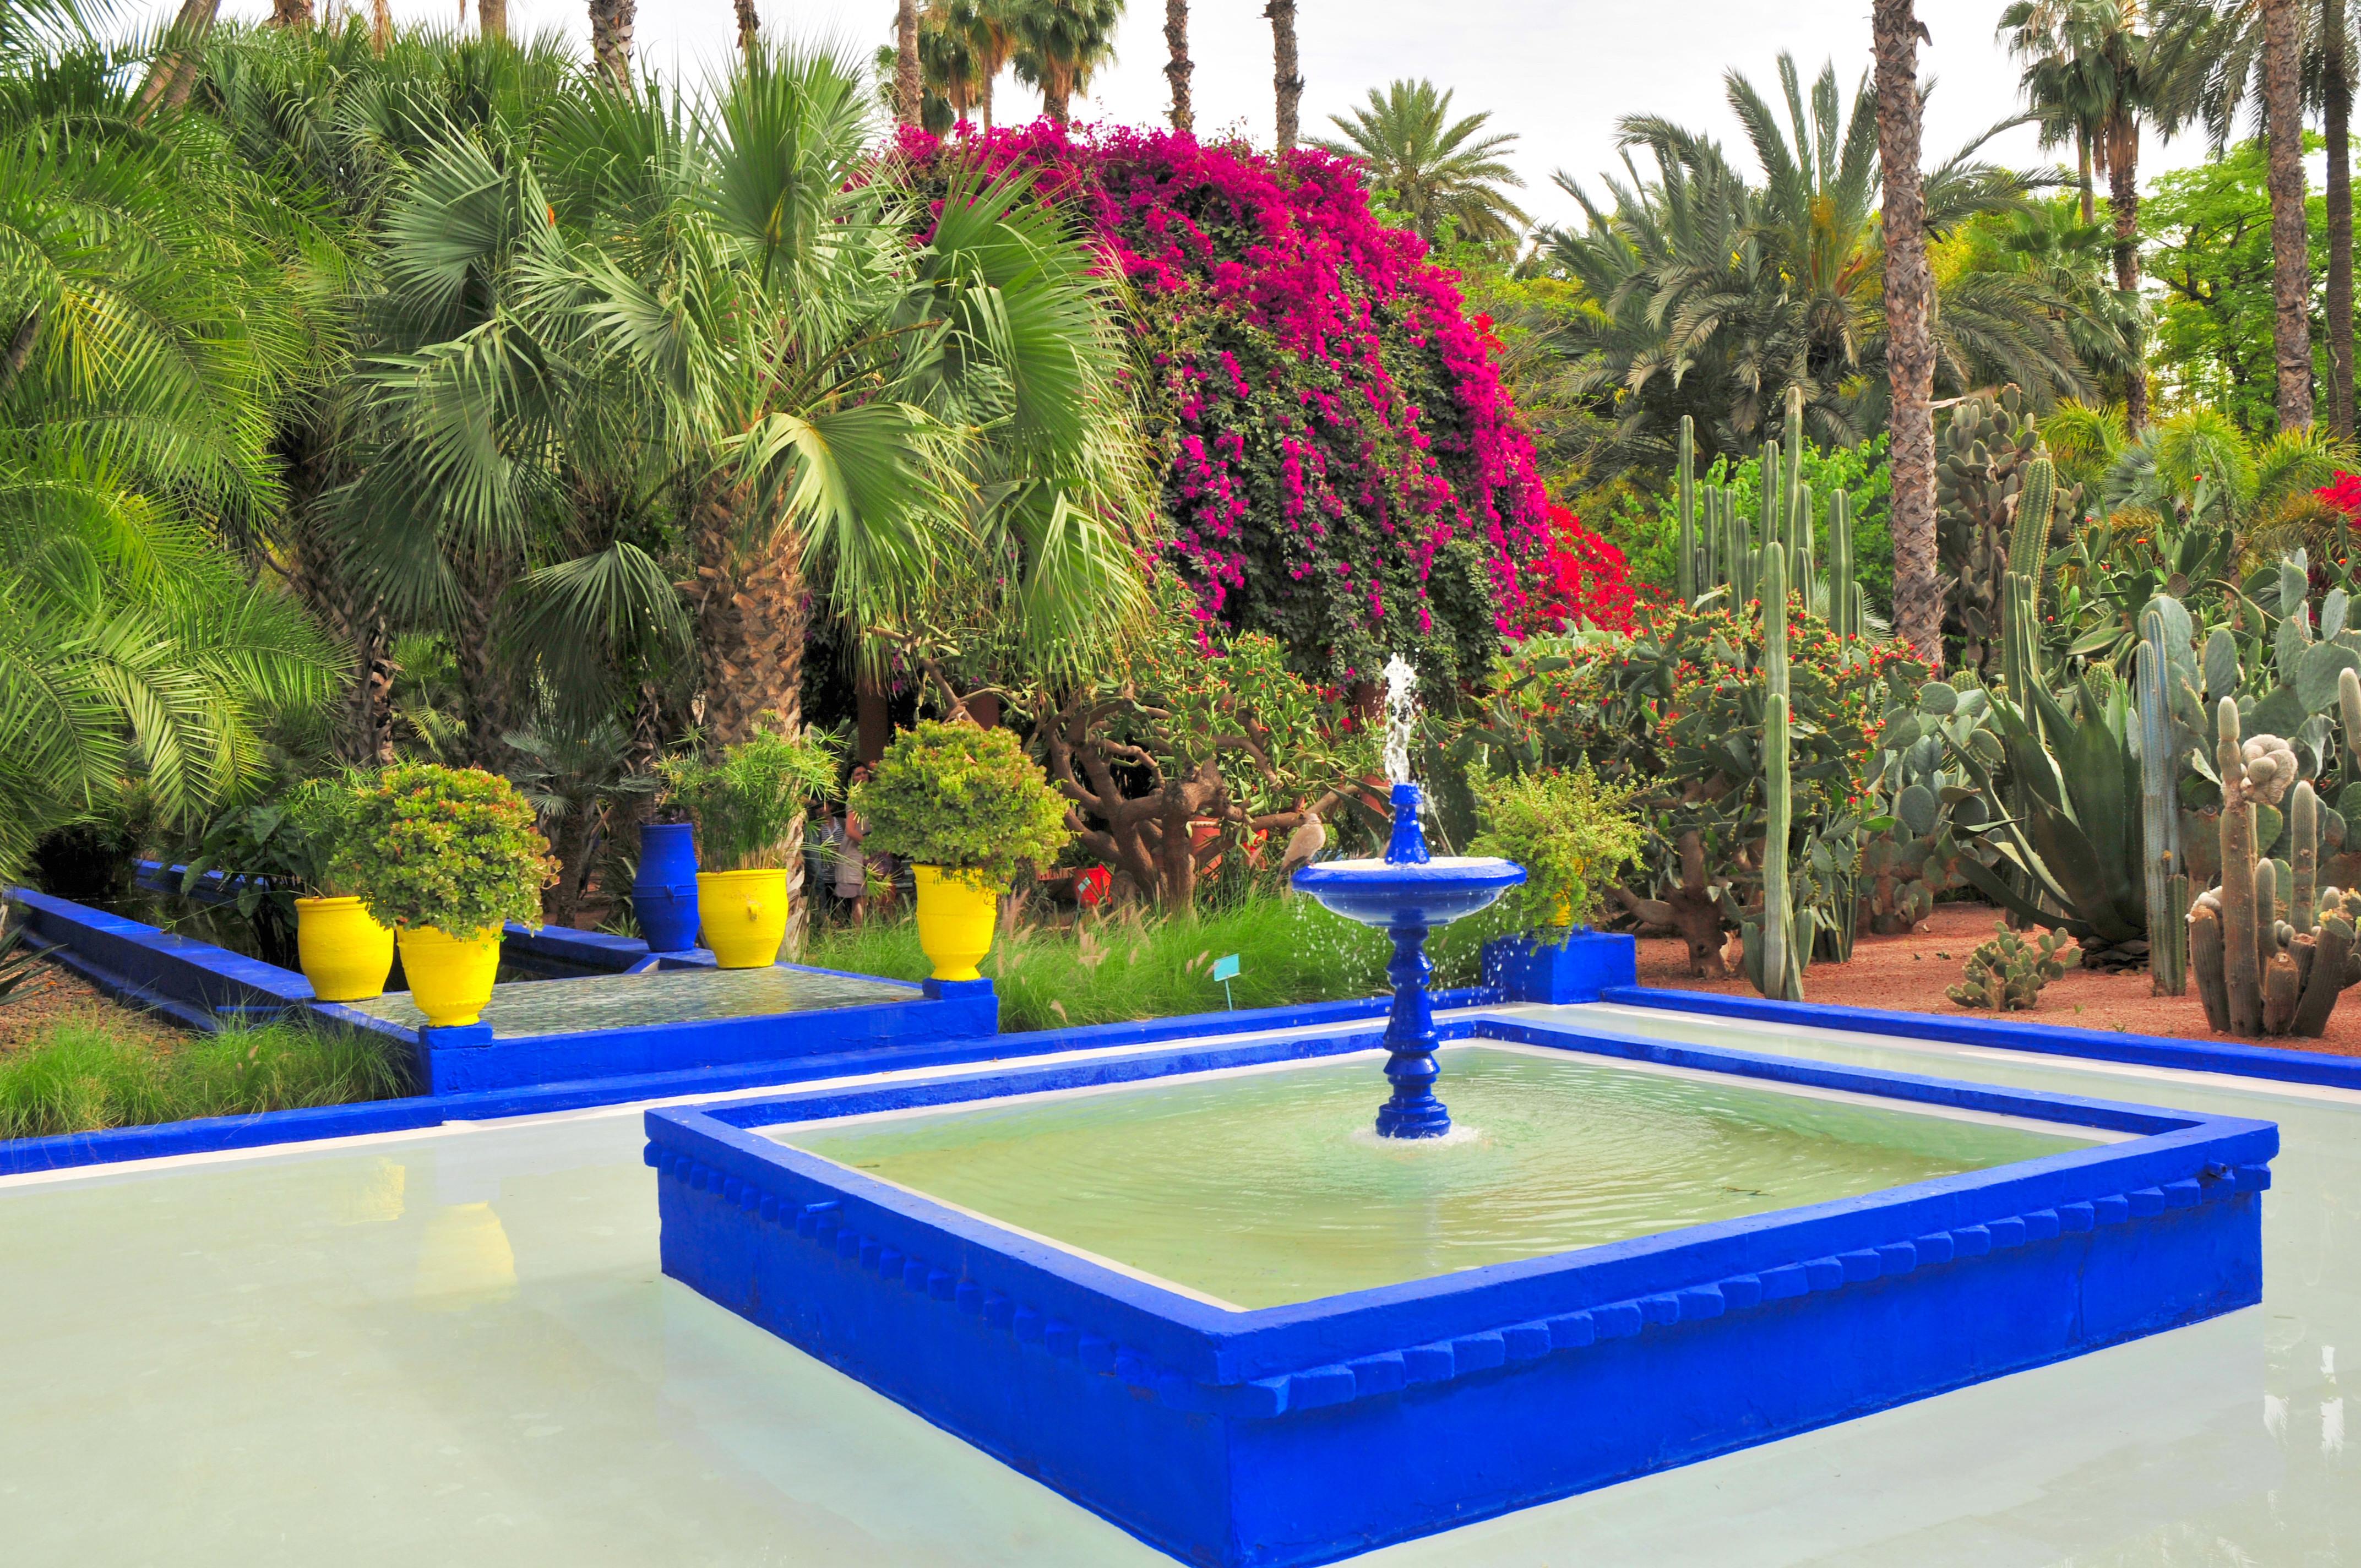 jardin majorelle marrakech morocco jardin majorelle pinterest marrakech morocco. Black Bedroom Furniture Sets. Home Design Ideas